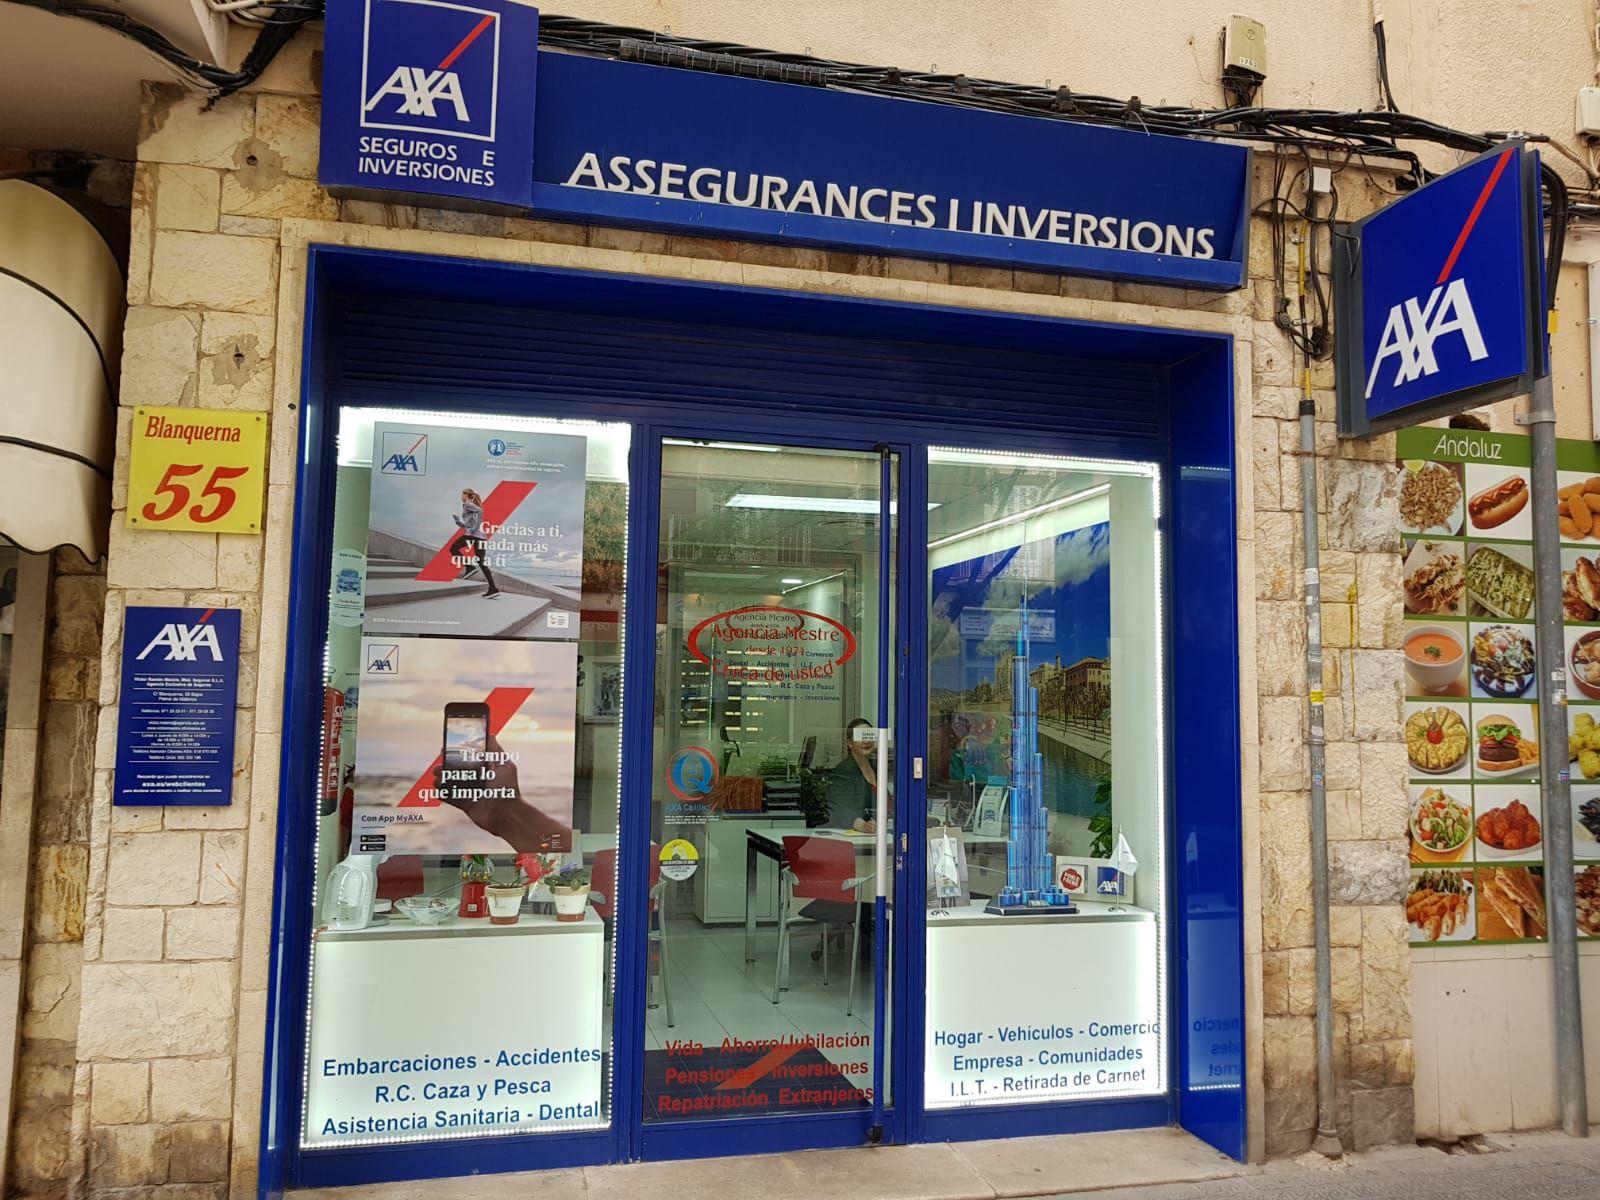 Encuenta tu seguro aquí en Palma de Mallorca